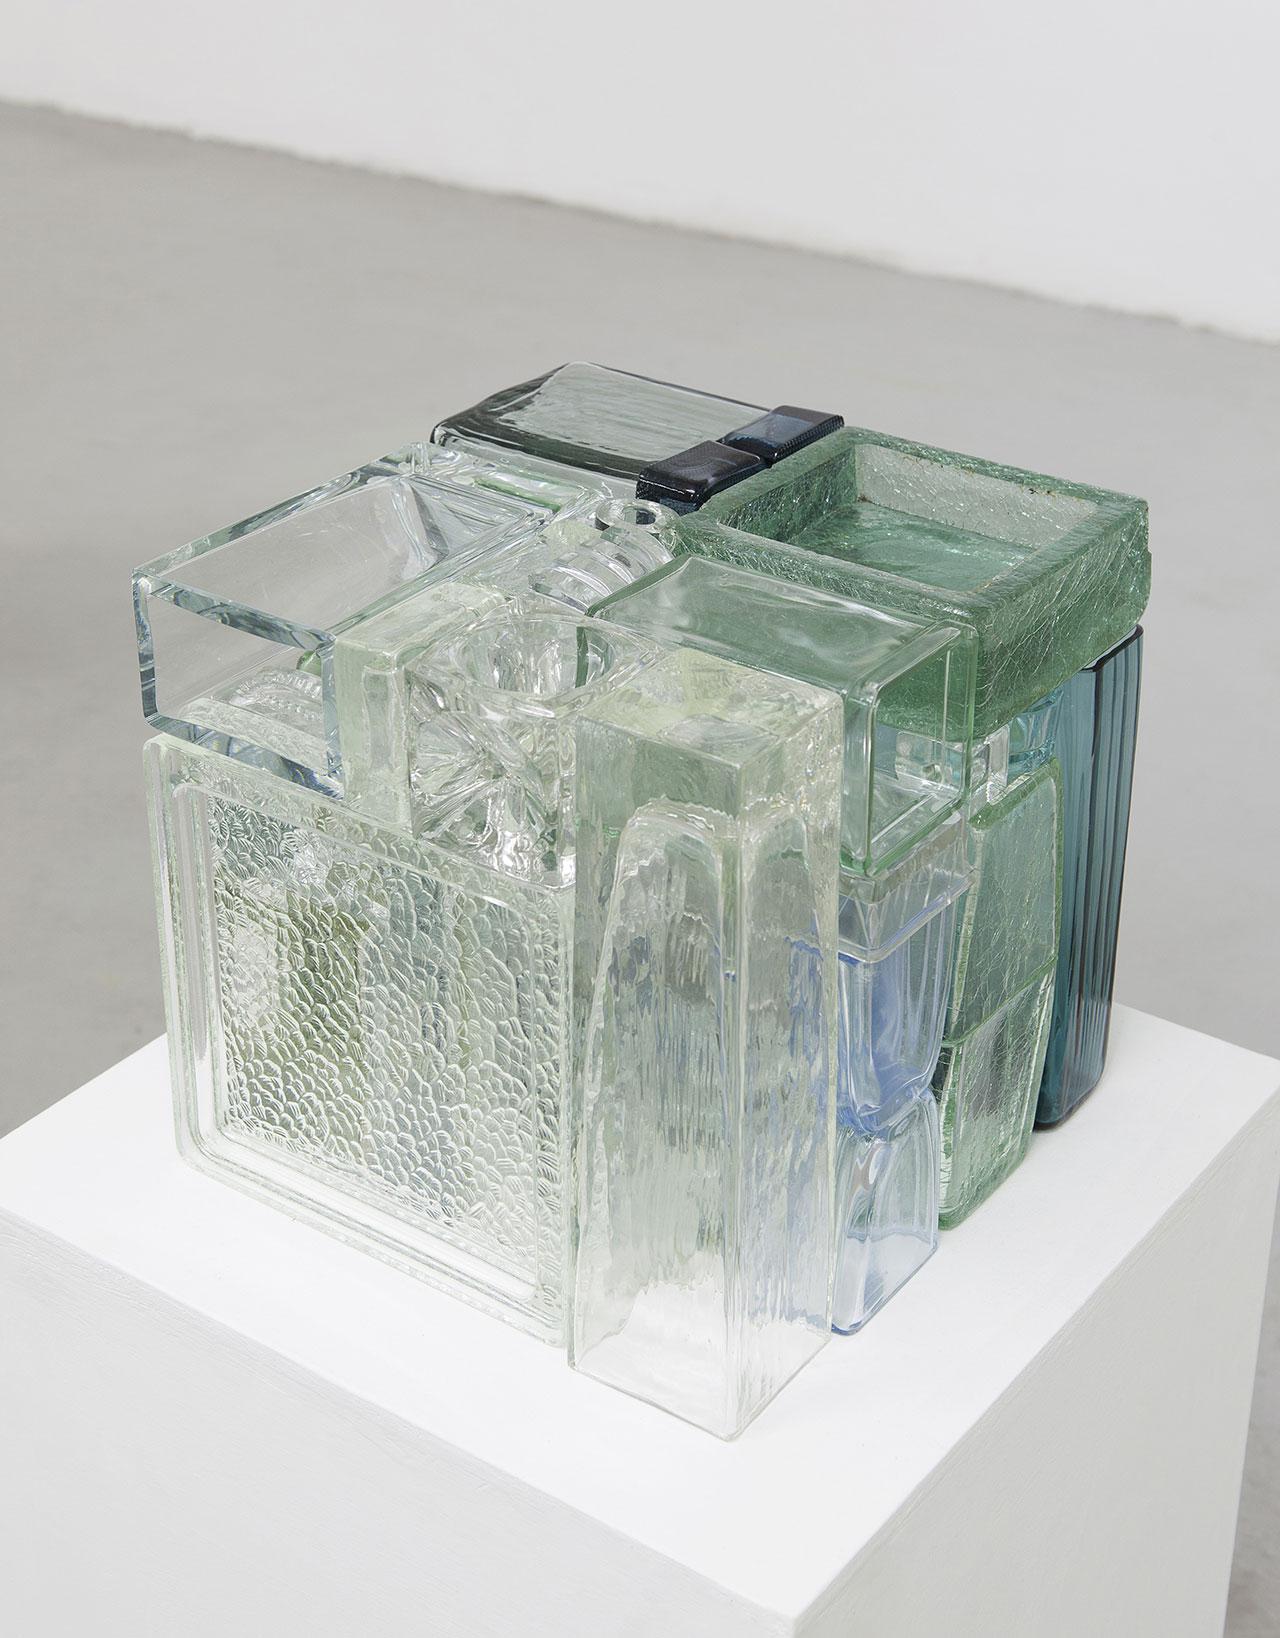 Michael Johansson,Trasparent crossfade, 2017, glass items,28x28x28 cm. Courtesy: The Flat – Massimo Carasi, Milan. Photo © Michael Johansson.